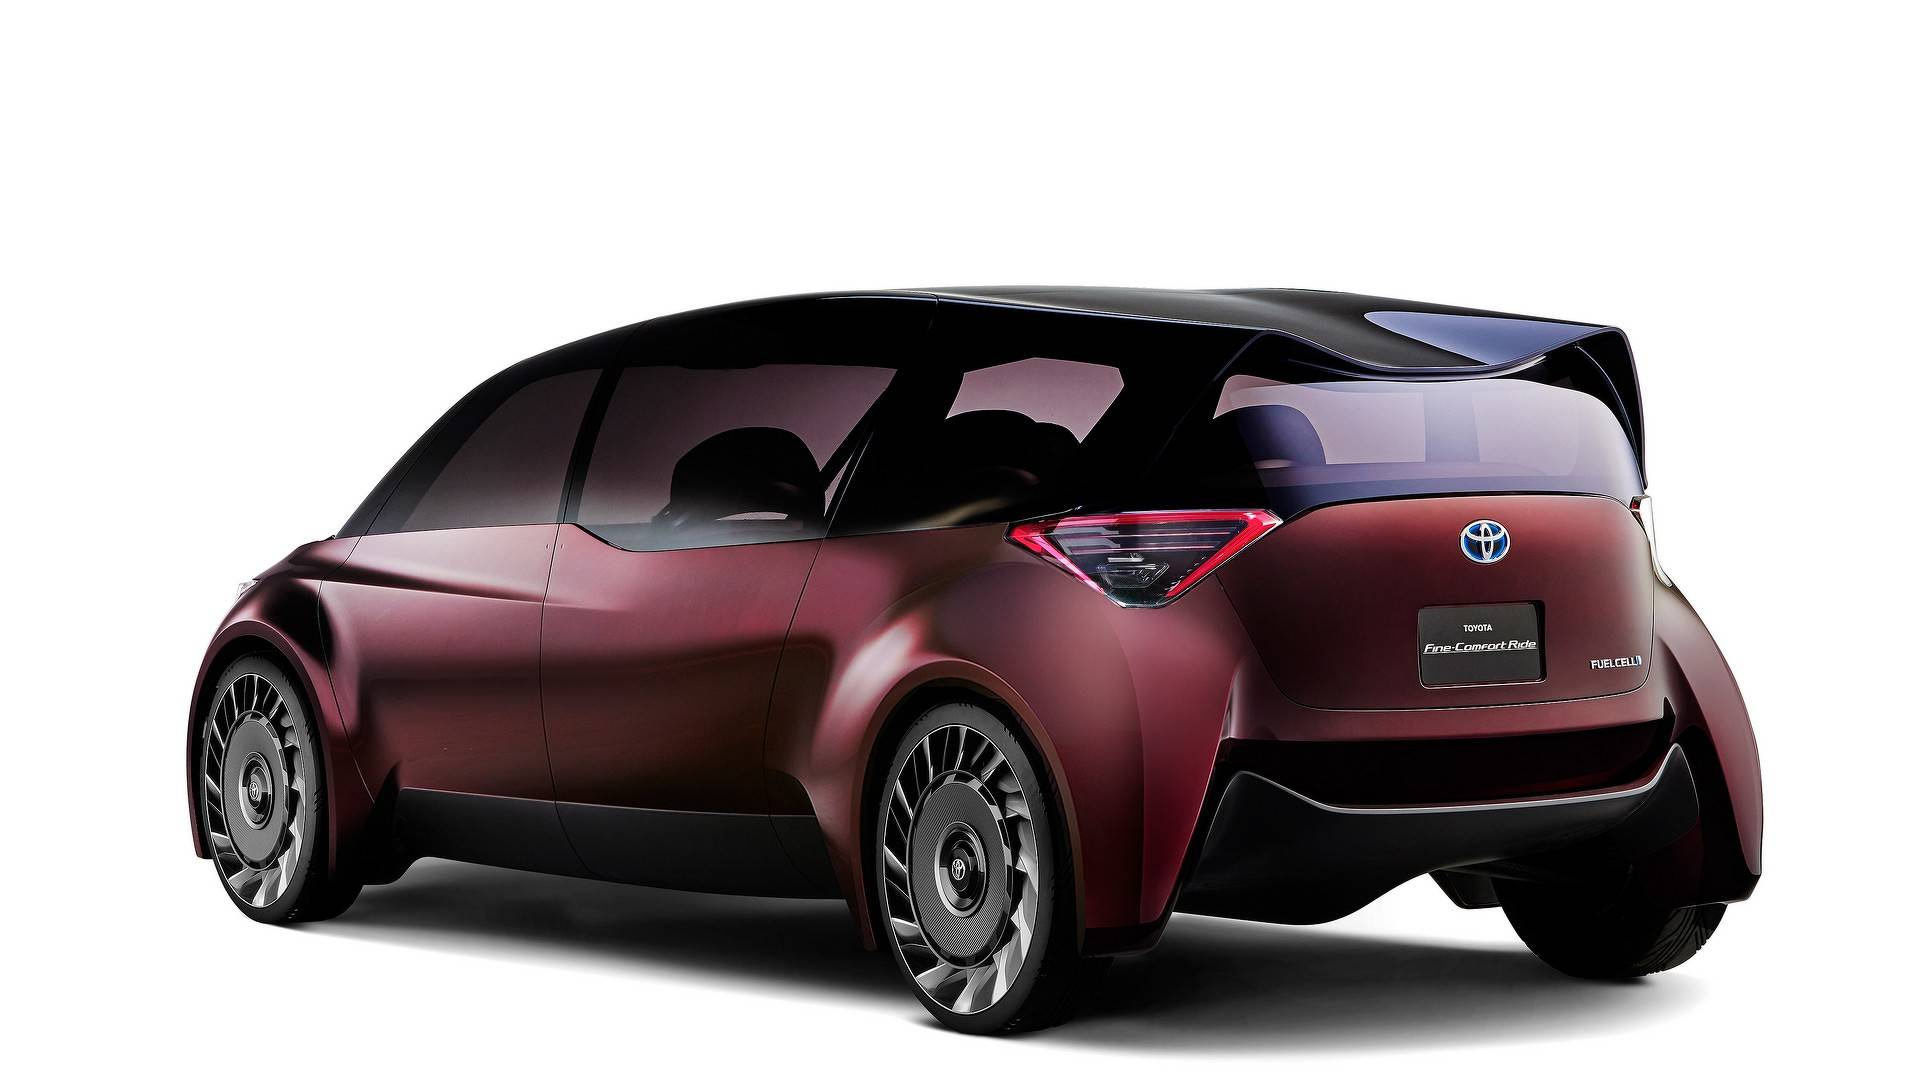 toyota-fine-comfort-ride-concept (8)